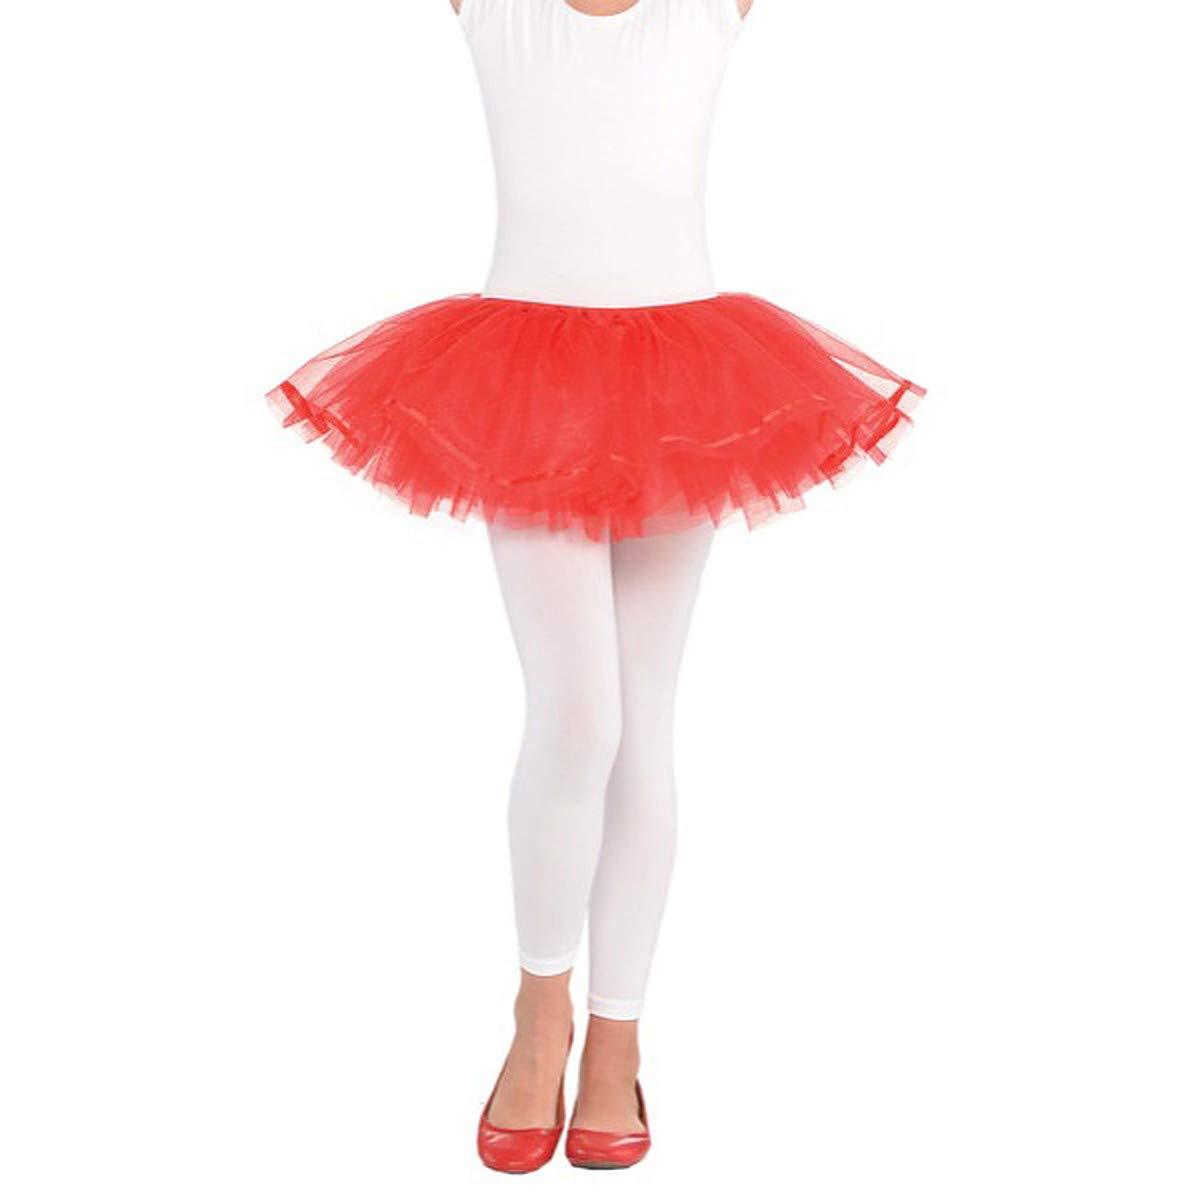 Child S//M 3 Ct. Red Shimmer Tutu